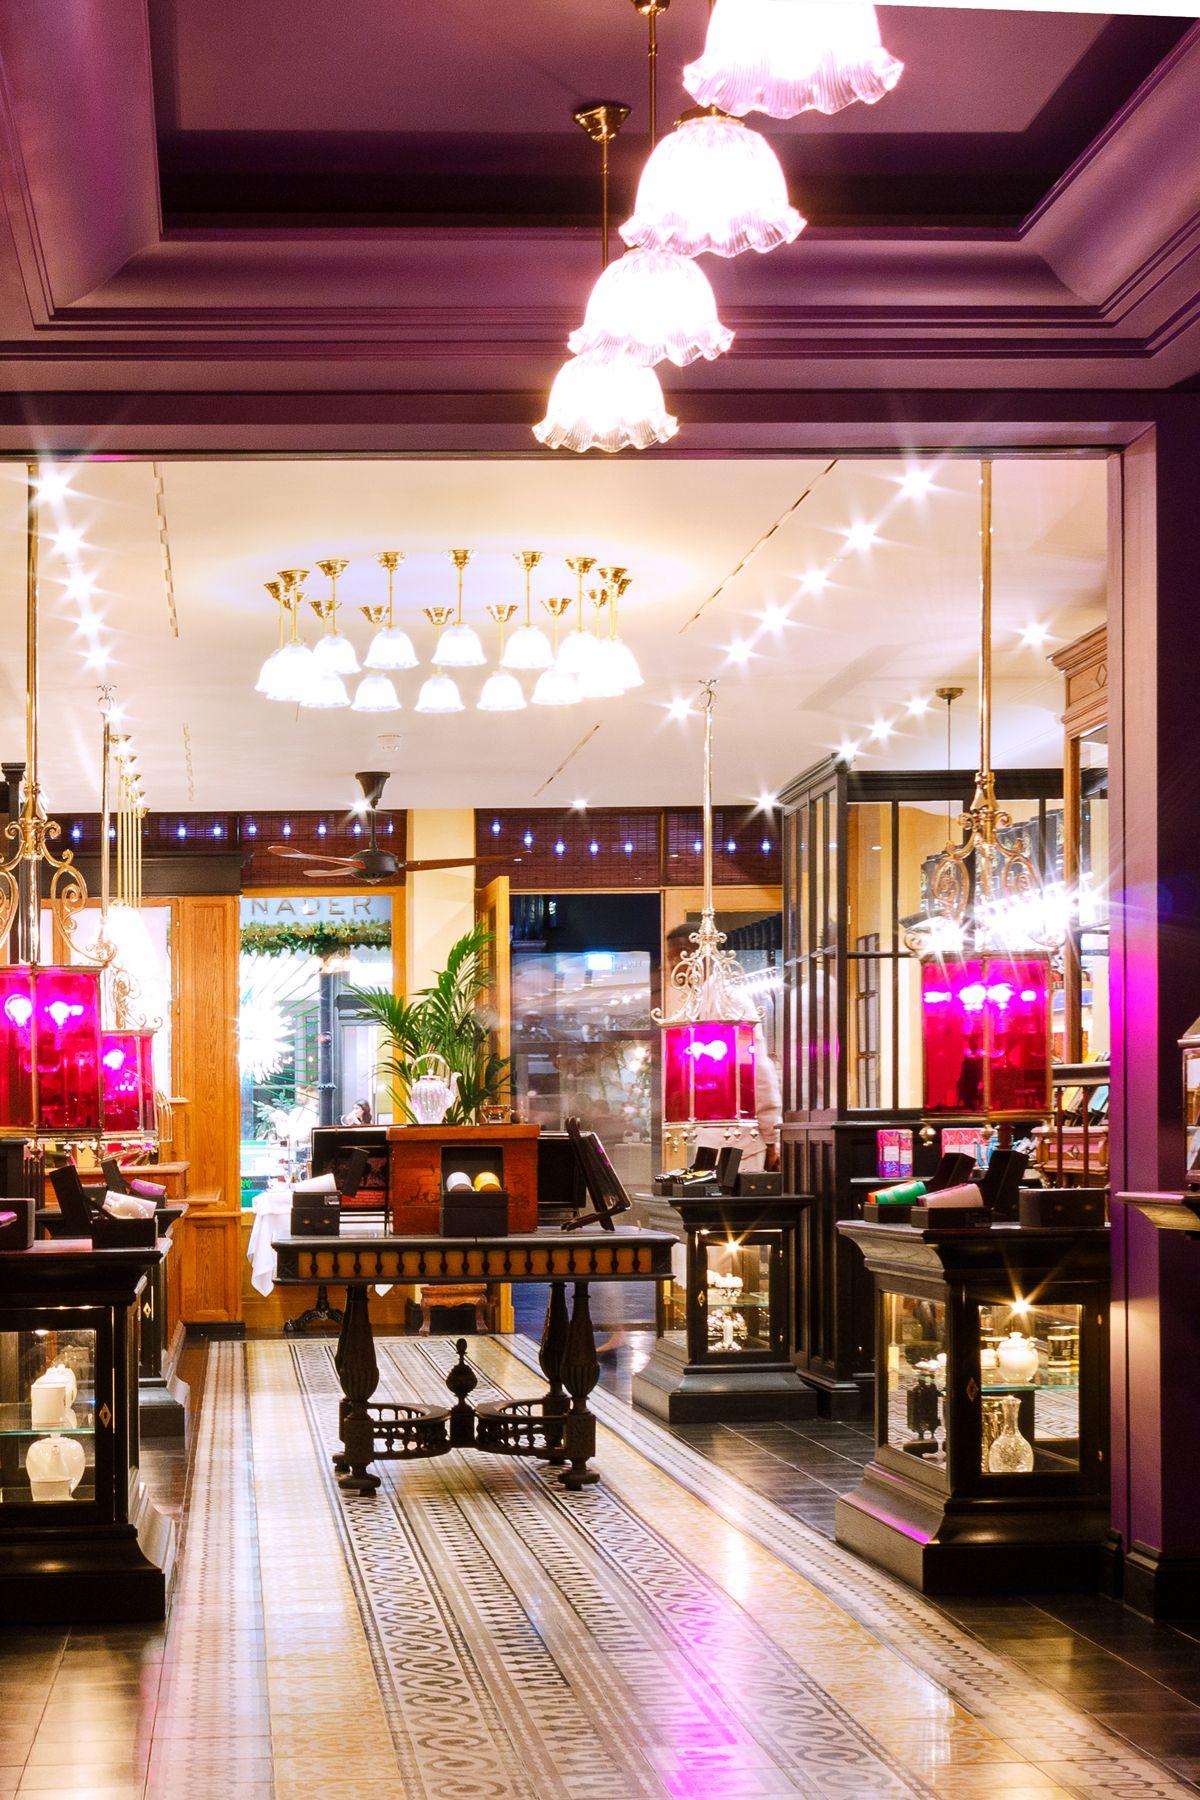 Ooh Lala Enjoy A Famous Parisian Tea Room Experience In London